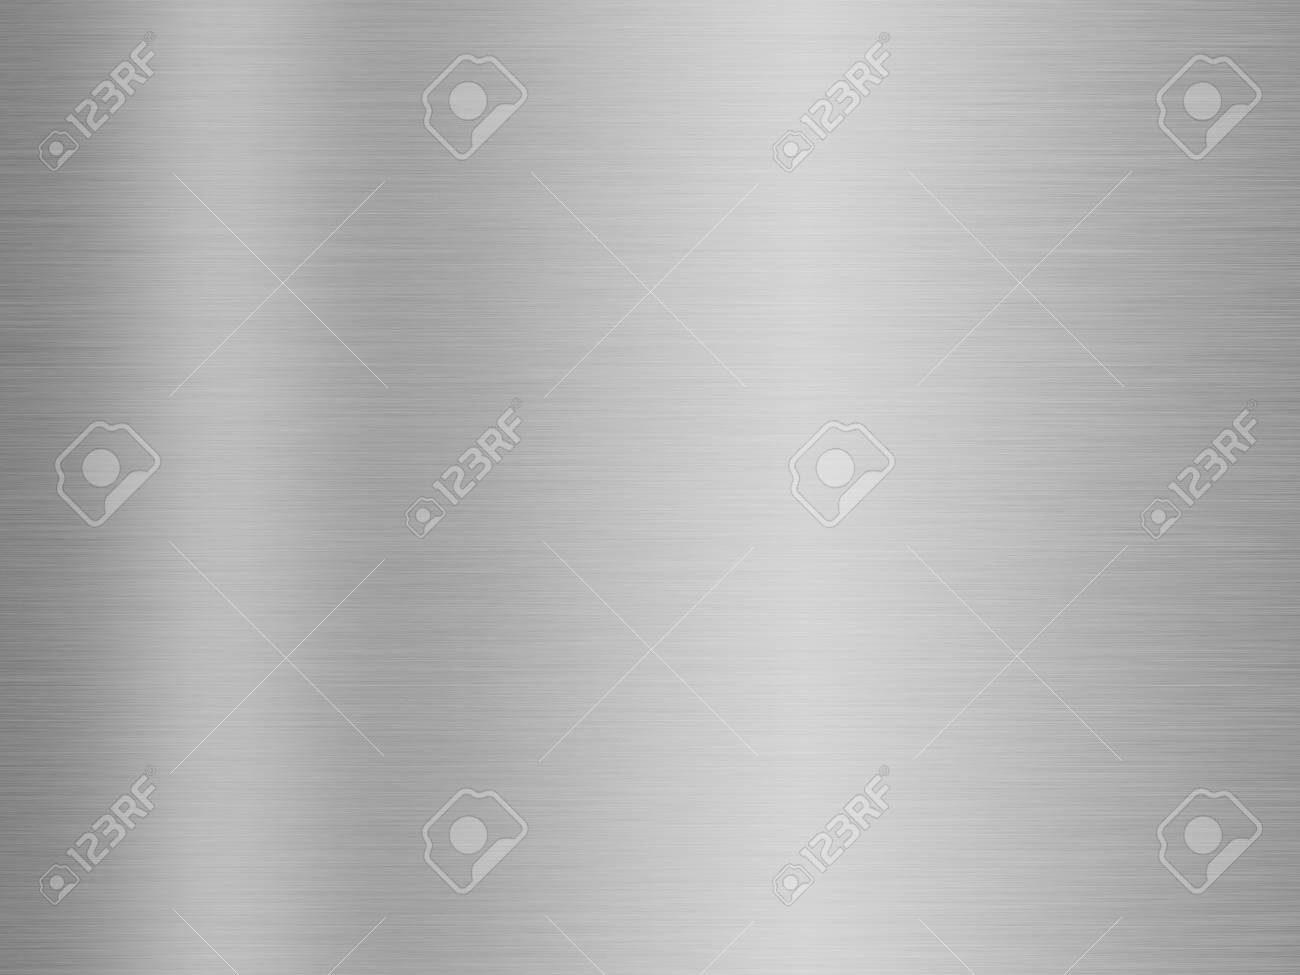 texture en acier inoxydable ou en métal texture de fond Banque d'images - 75076757